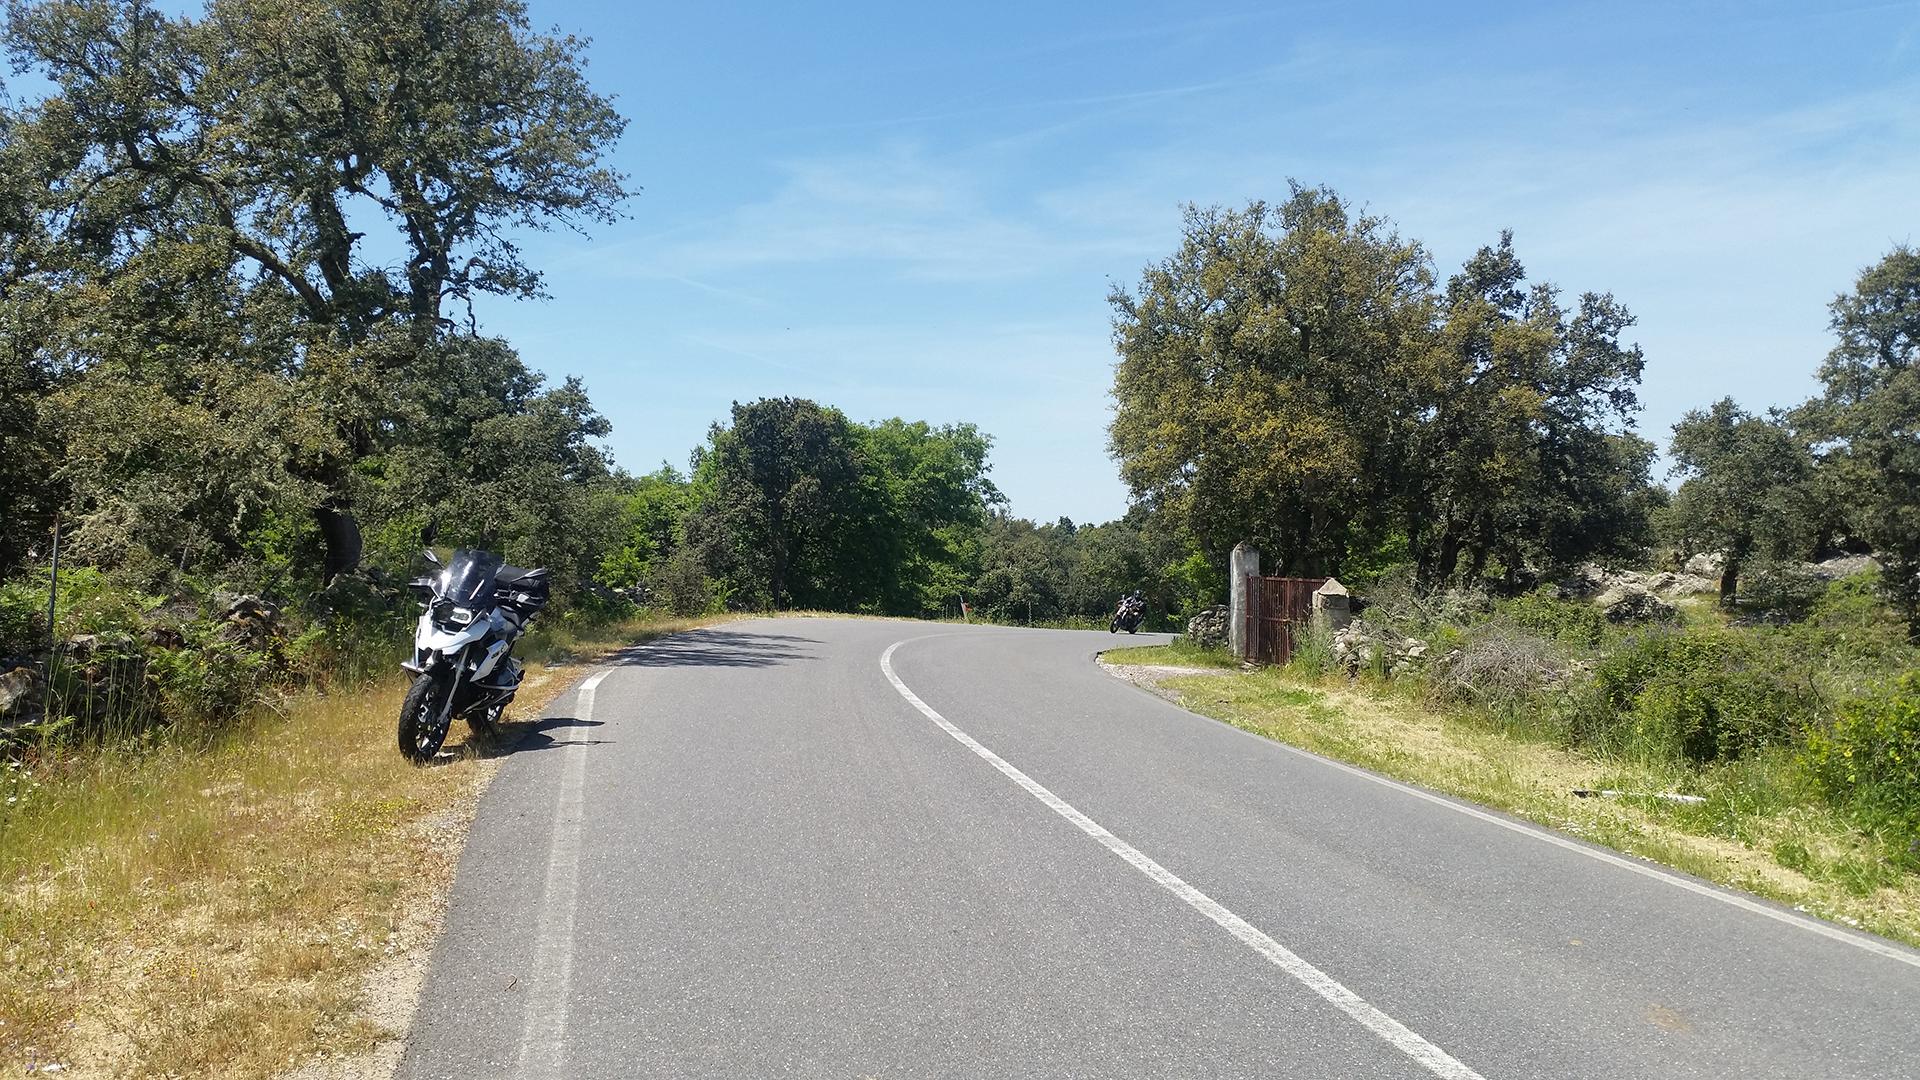 0824 - I (Sardegna) - Punta Nura